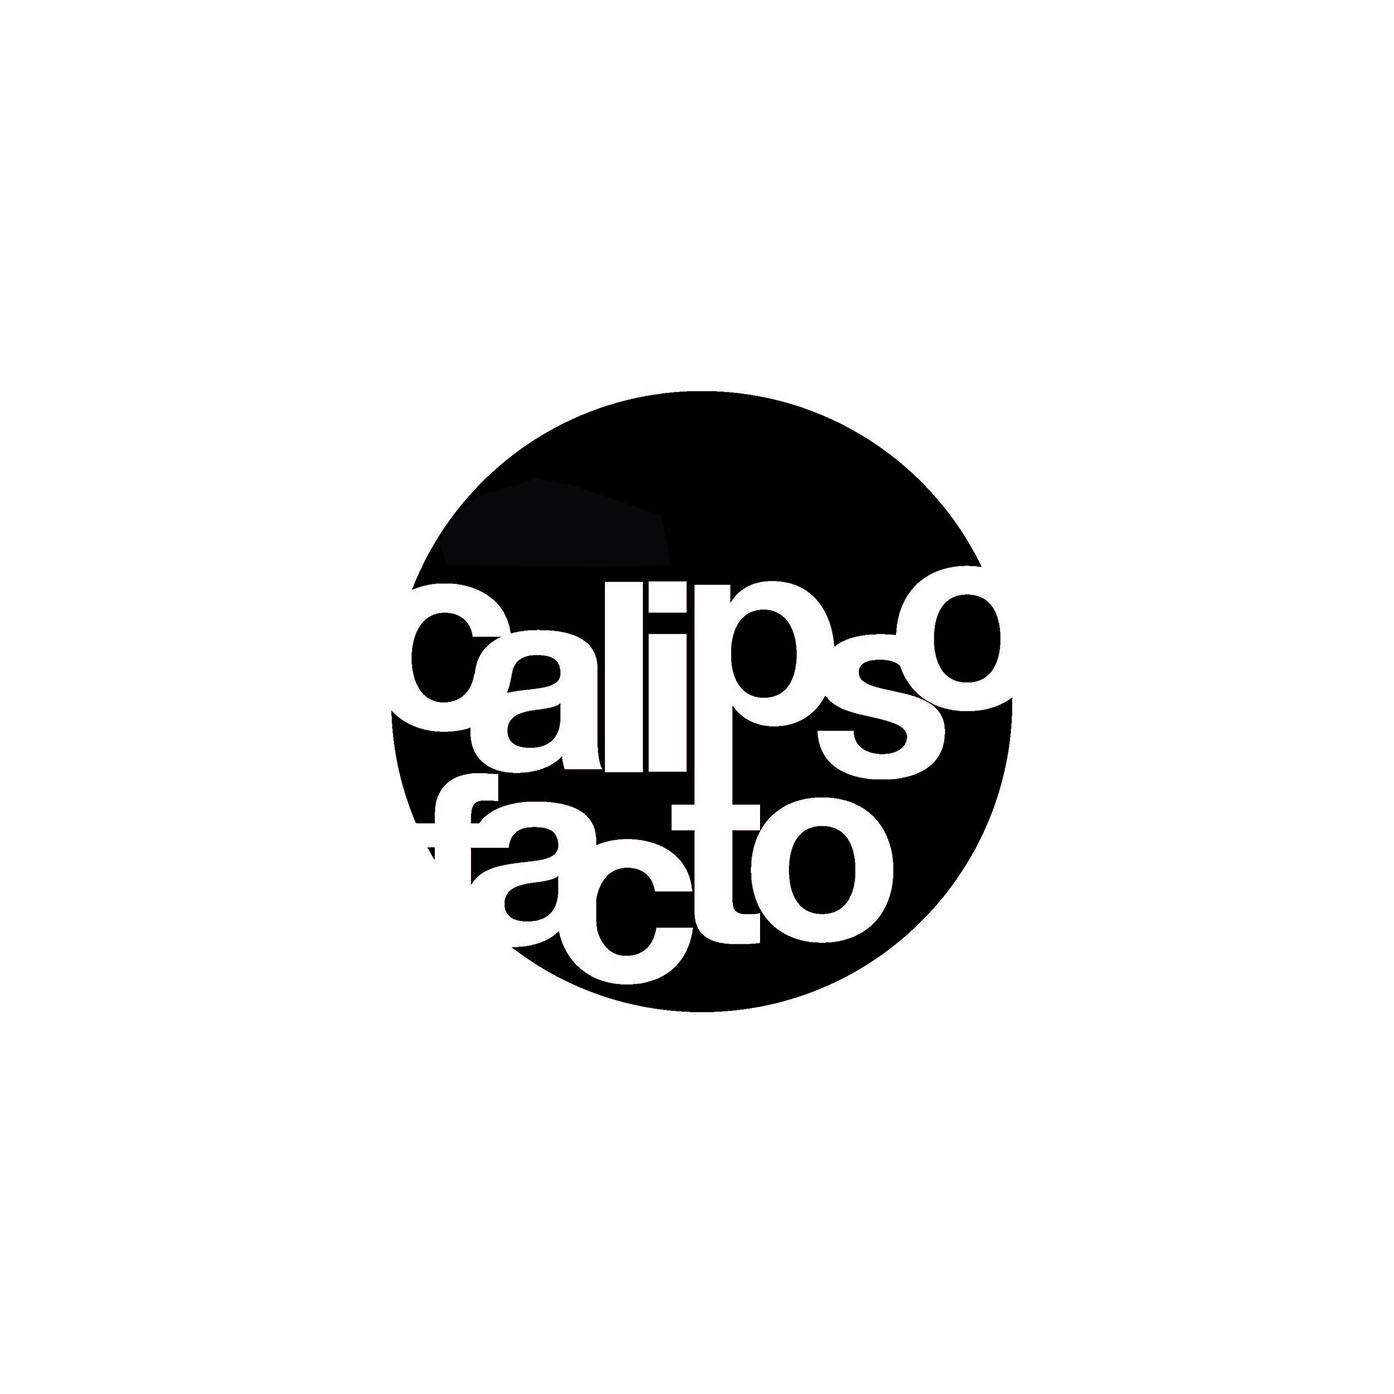 Logo Calipso